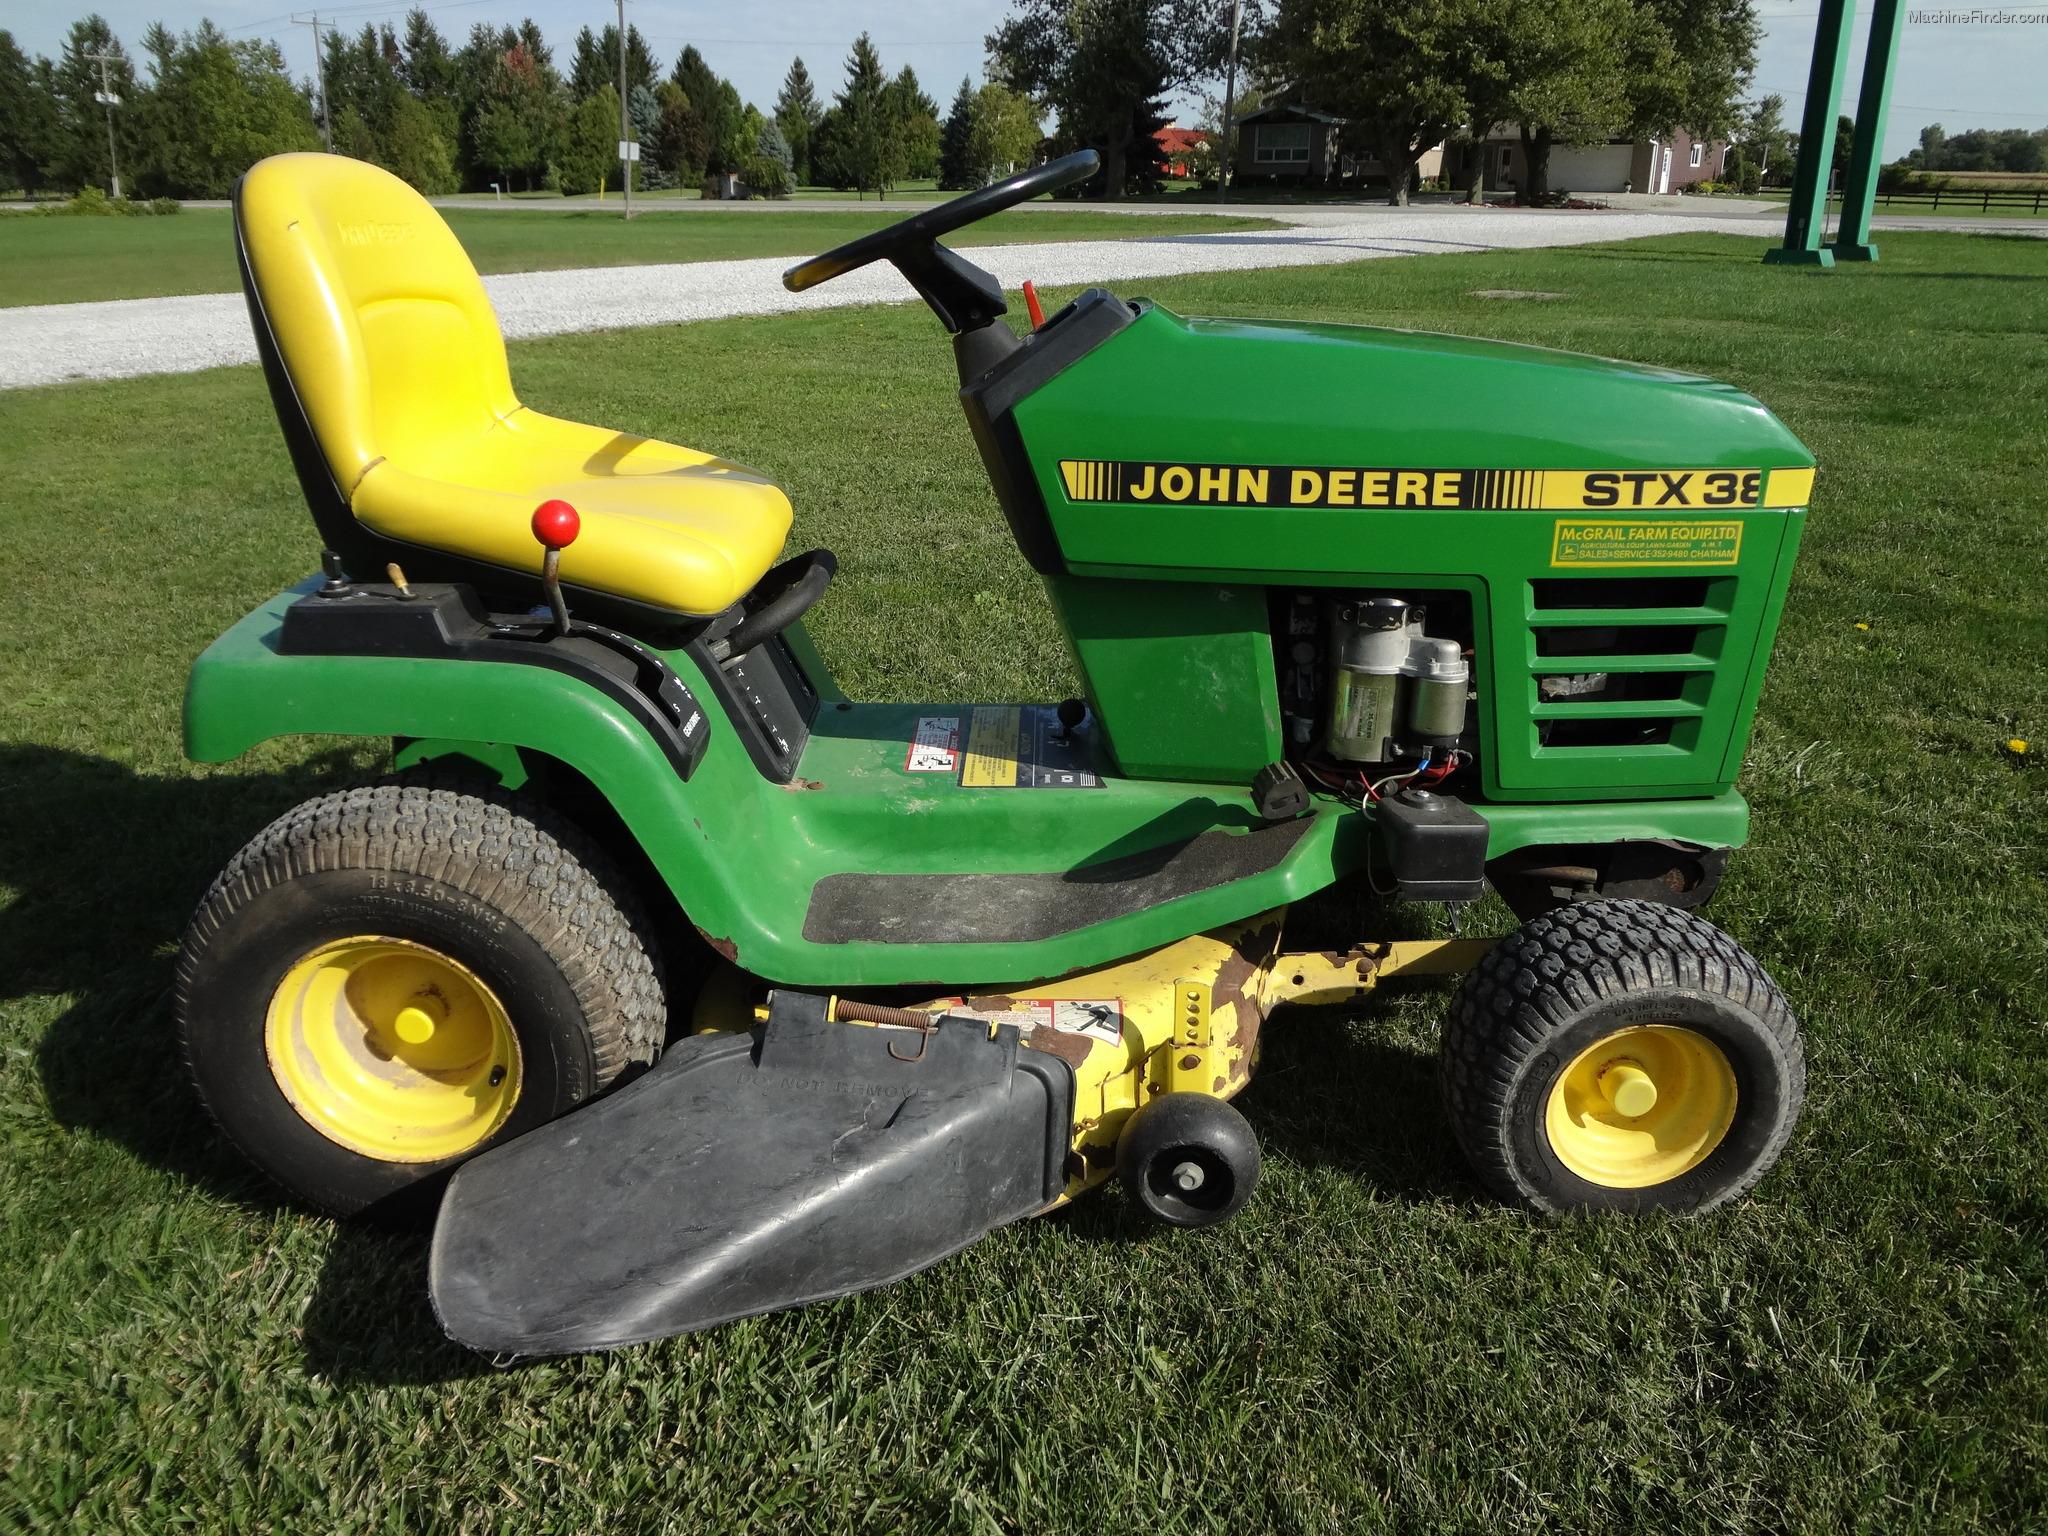 John Deere Stx 38 : John deere stx gear drive belt yellow deck